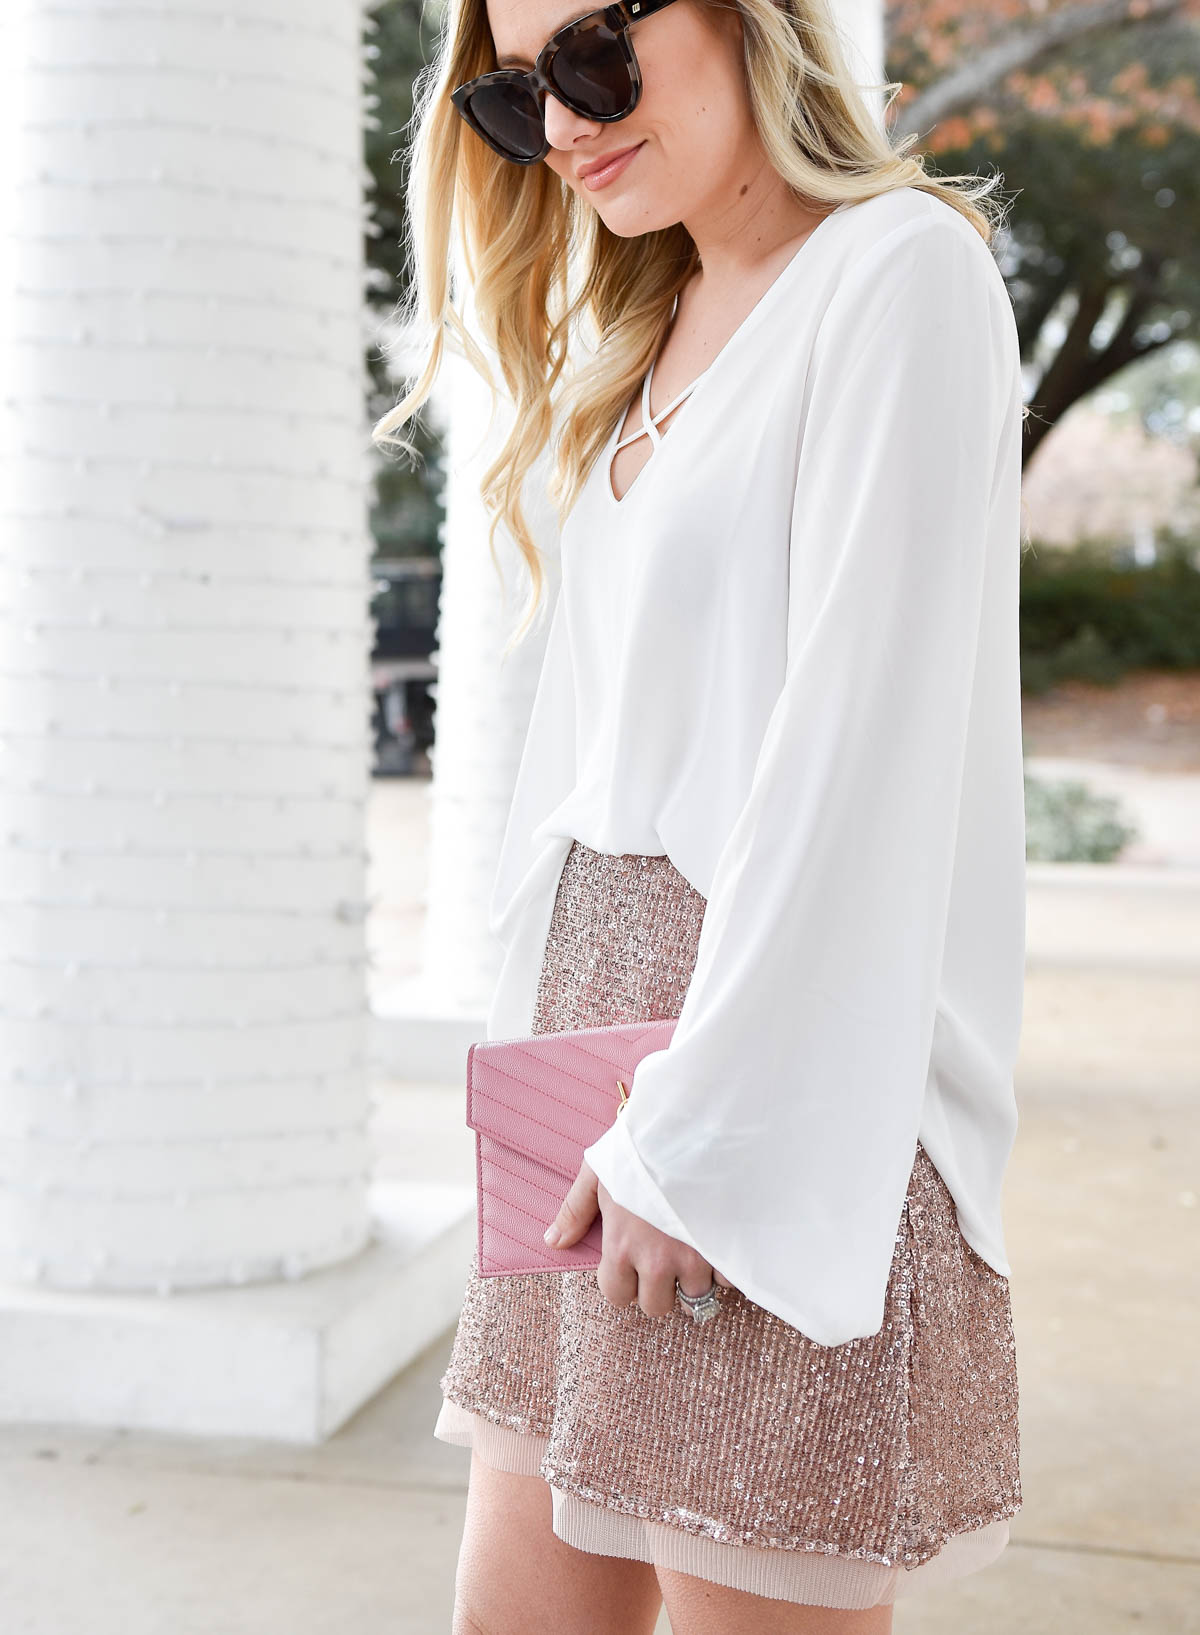 Nordstrom, Nordstrom-womens, Nordstrom-skirt, sequin-skirt, free-people-skirt, valentino-rockstuds, ssl-handbag, new-years-eve-outfit, pink-skirt